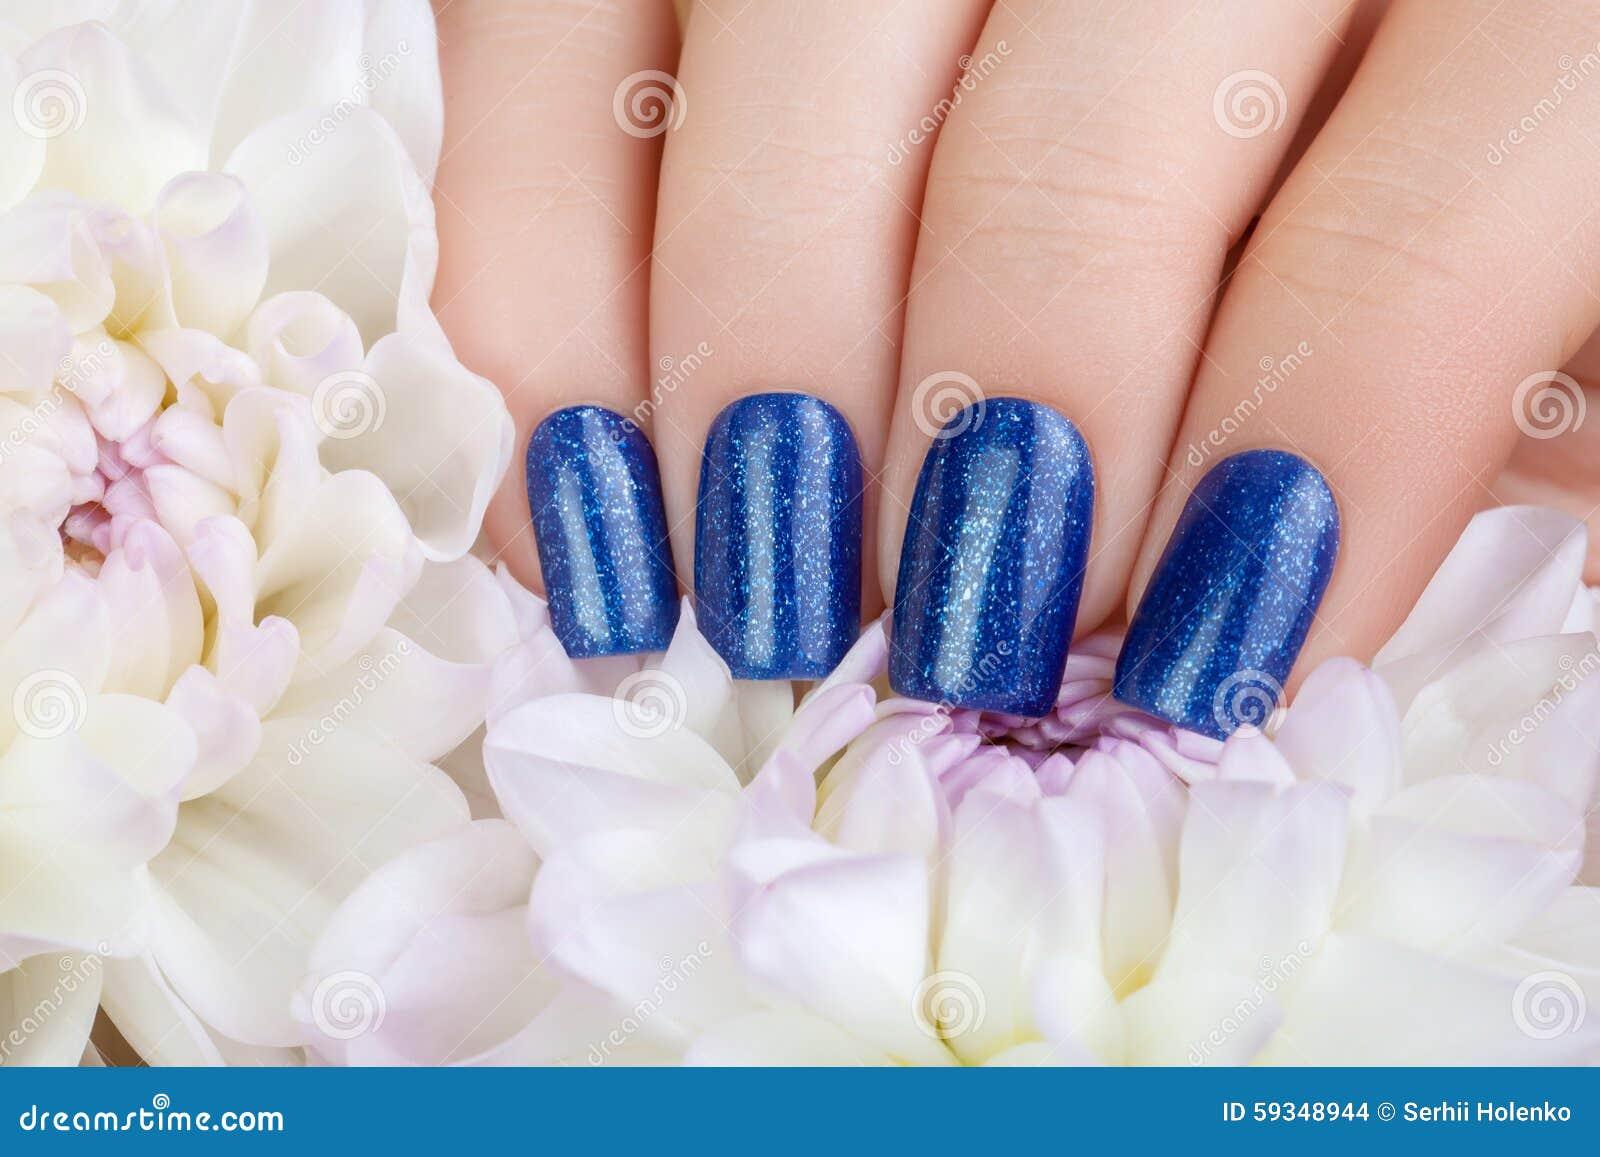 Blue nail polish stock photo image of creative beauty 59348944 download blue nail polish stock photo image of creative beauty 59348944 izmirmasajfo